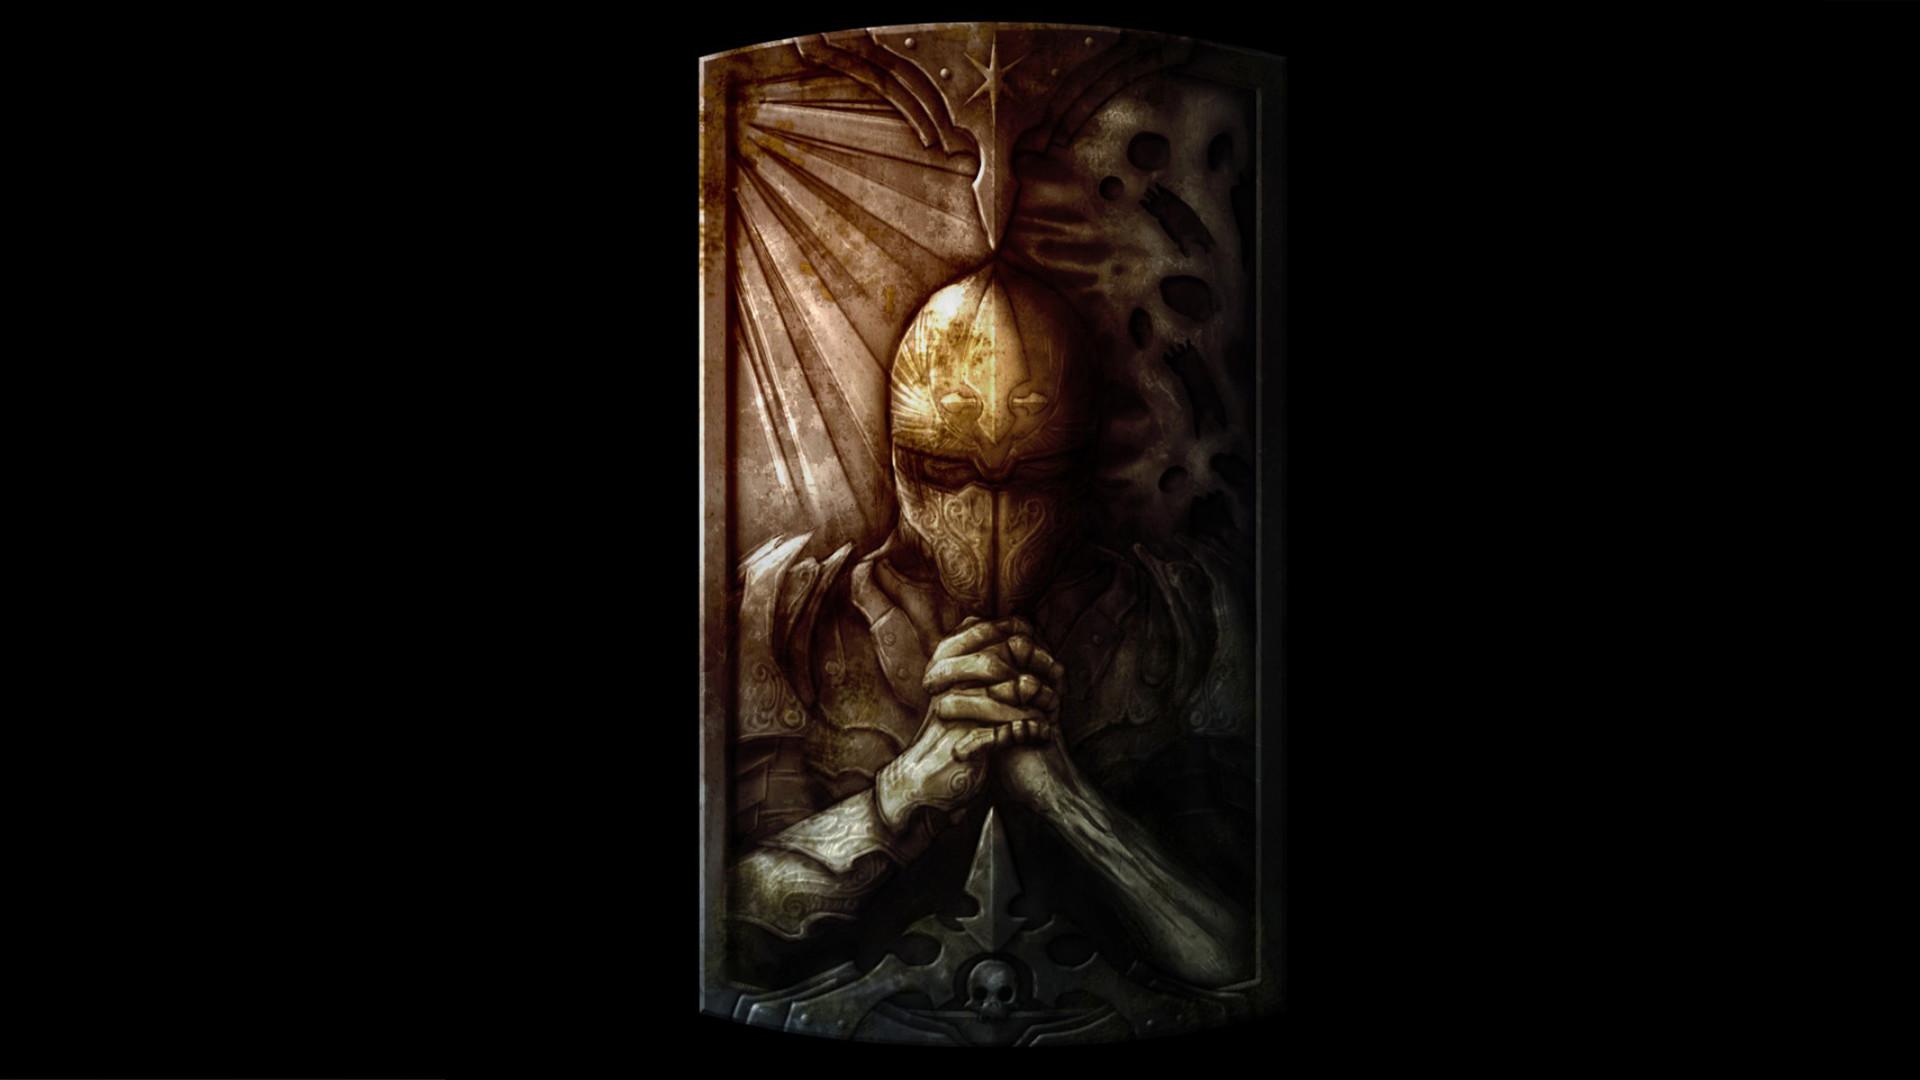 dark souls 2 / II game hd wallpaper